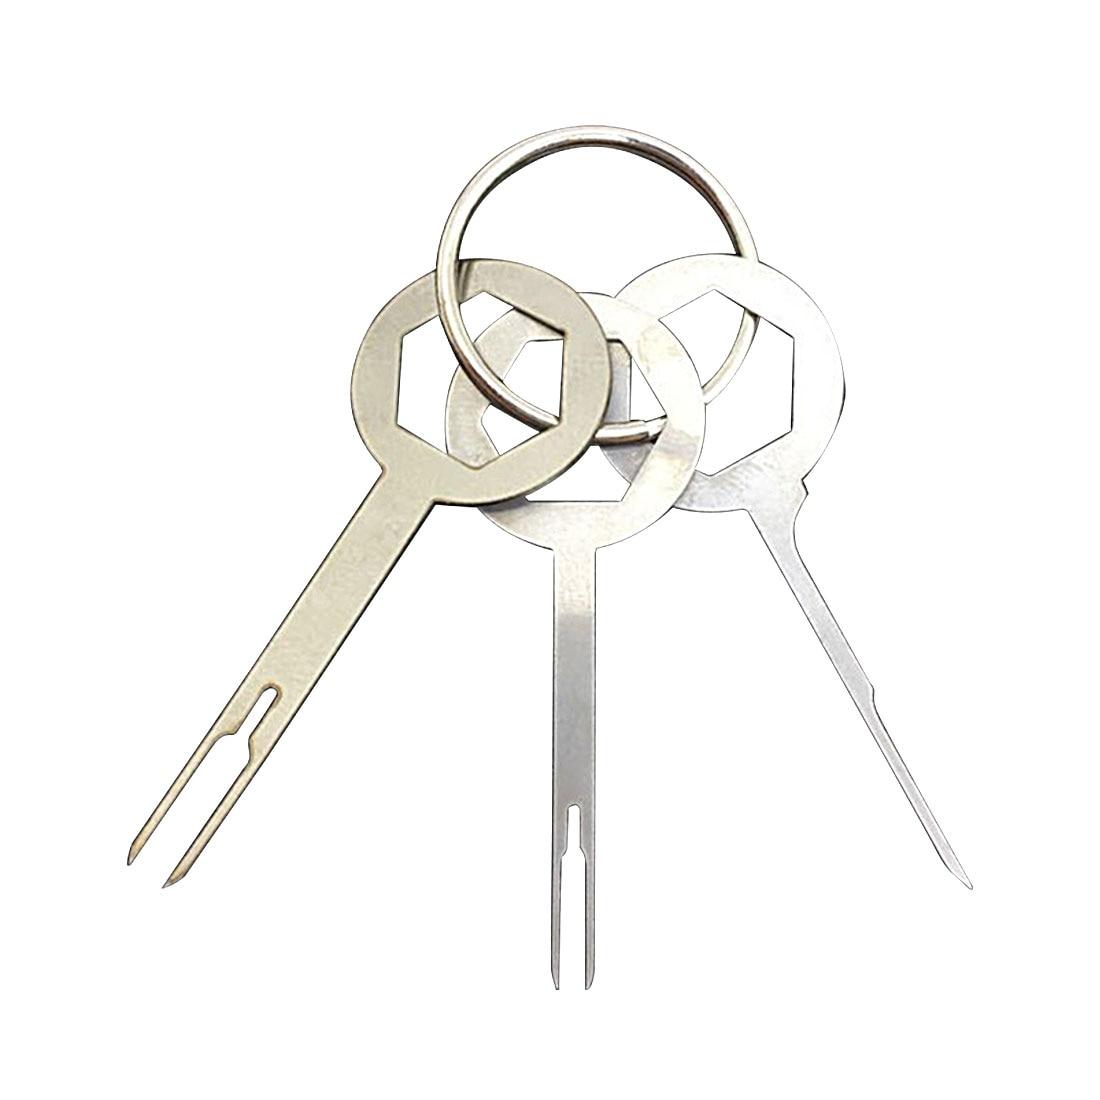 Купить с кэшбэком New 11Pcs/Set Automobiles Repair Tool Pin Extractor Kit Terminal Removal Tools Car Electrical Wiring Crimp Connector